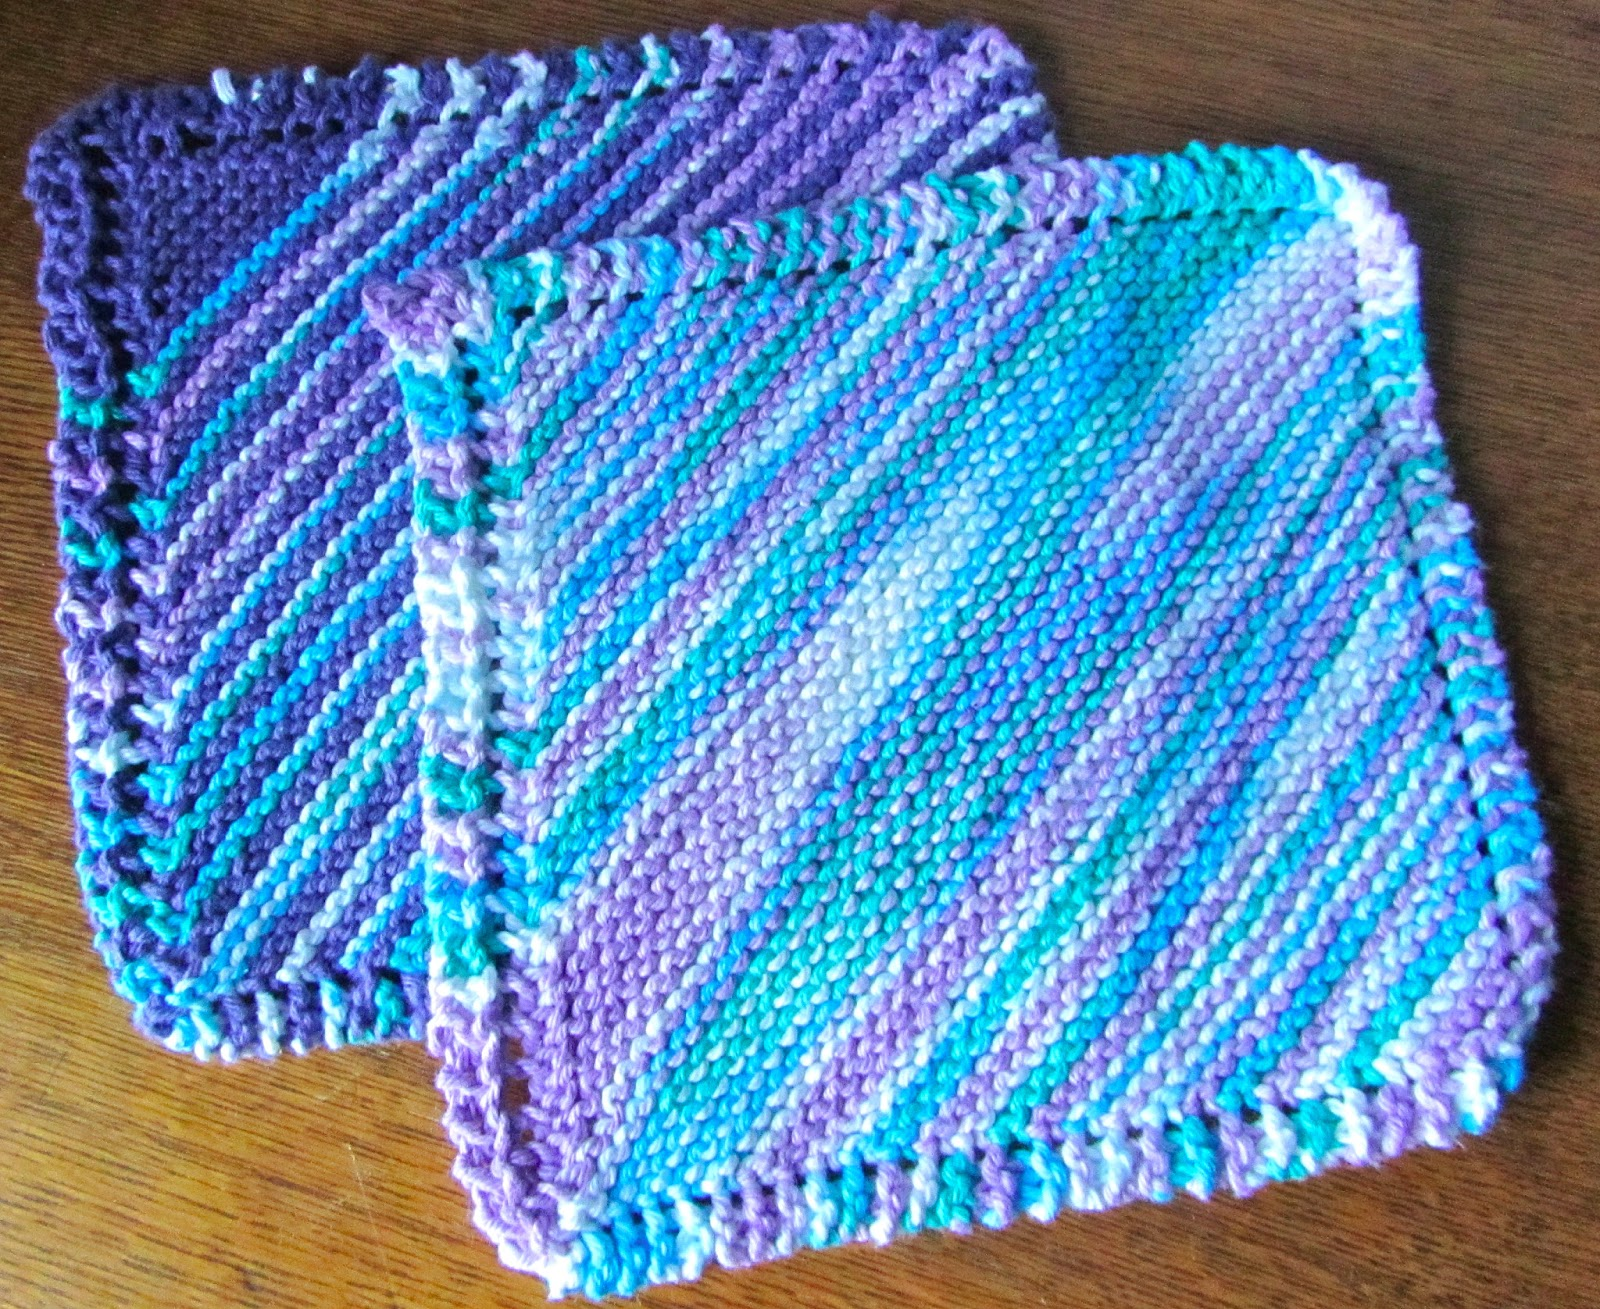 Knitting Granny Dishcloth : Finished object friday